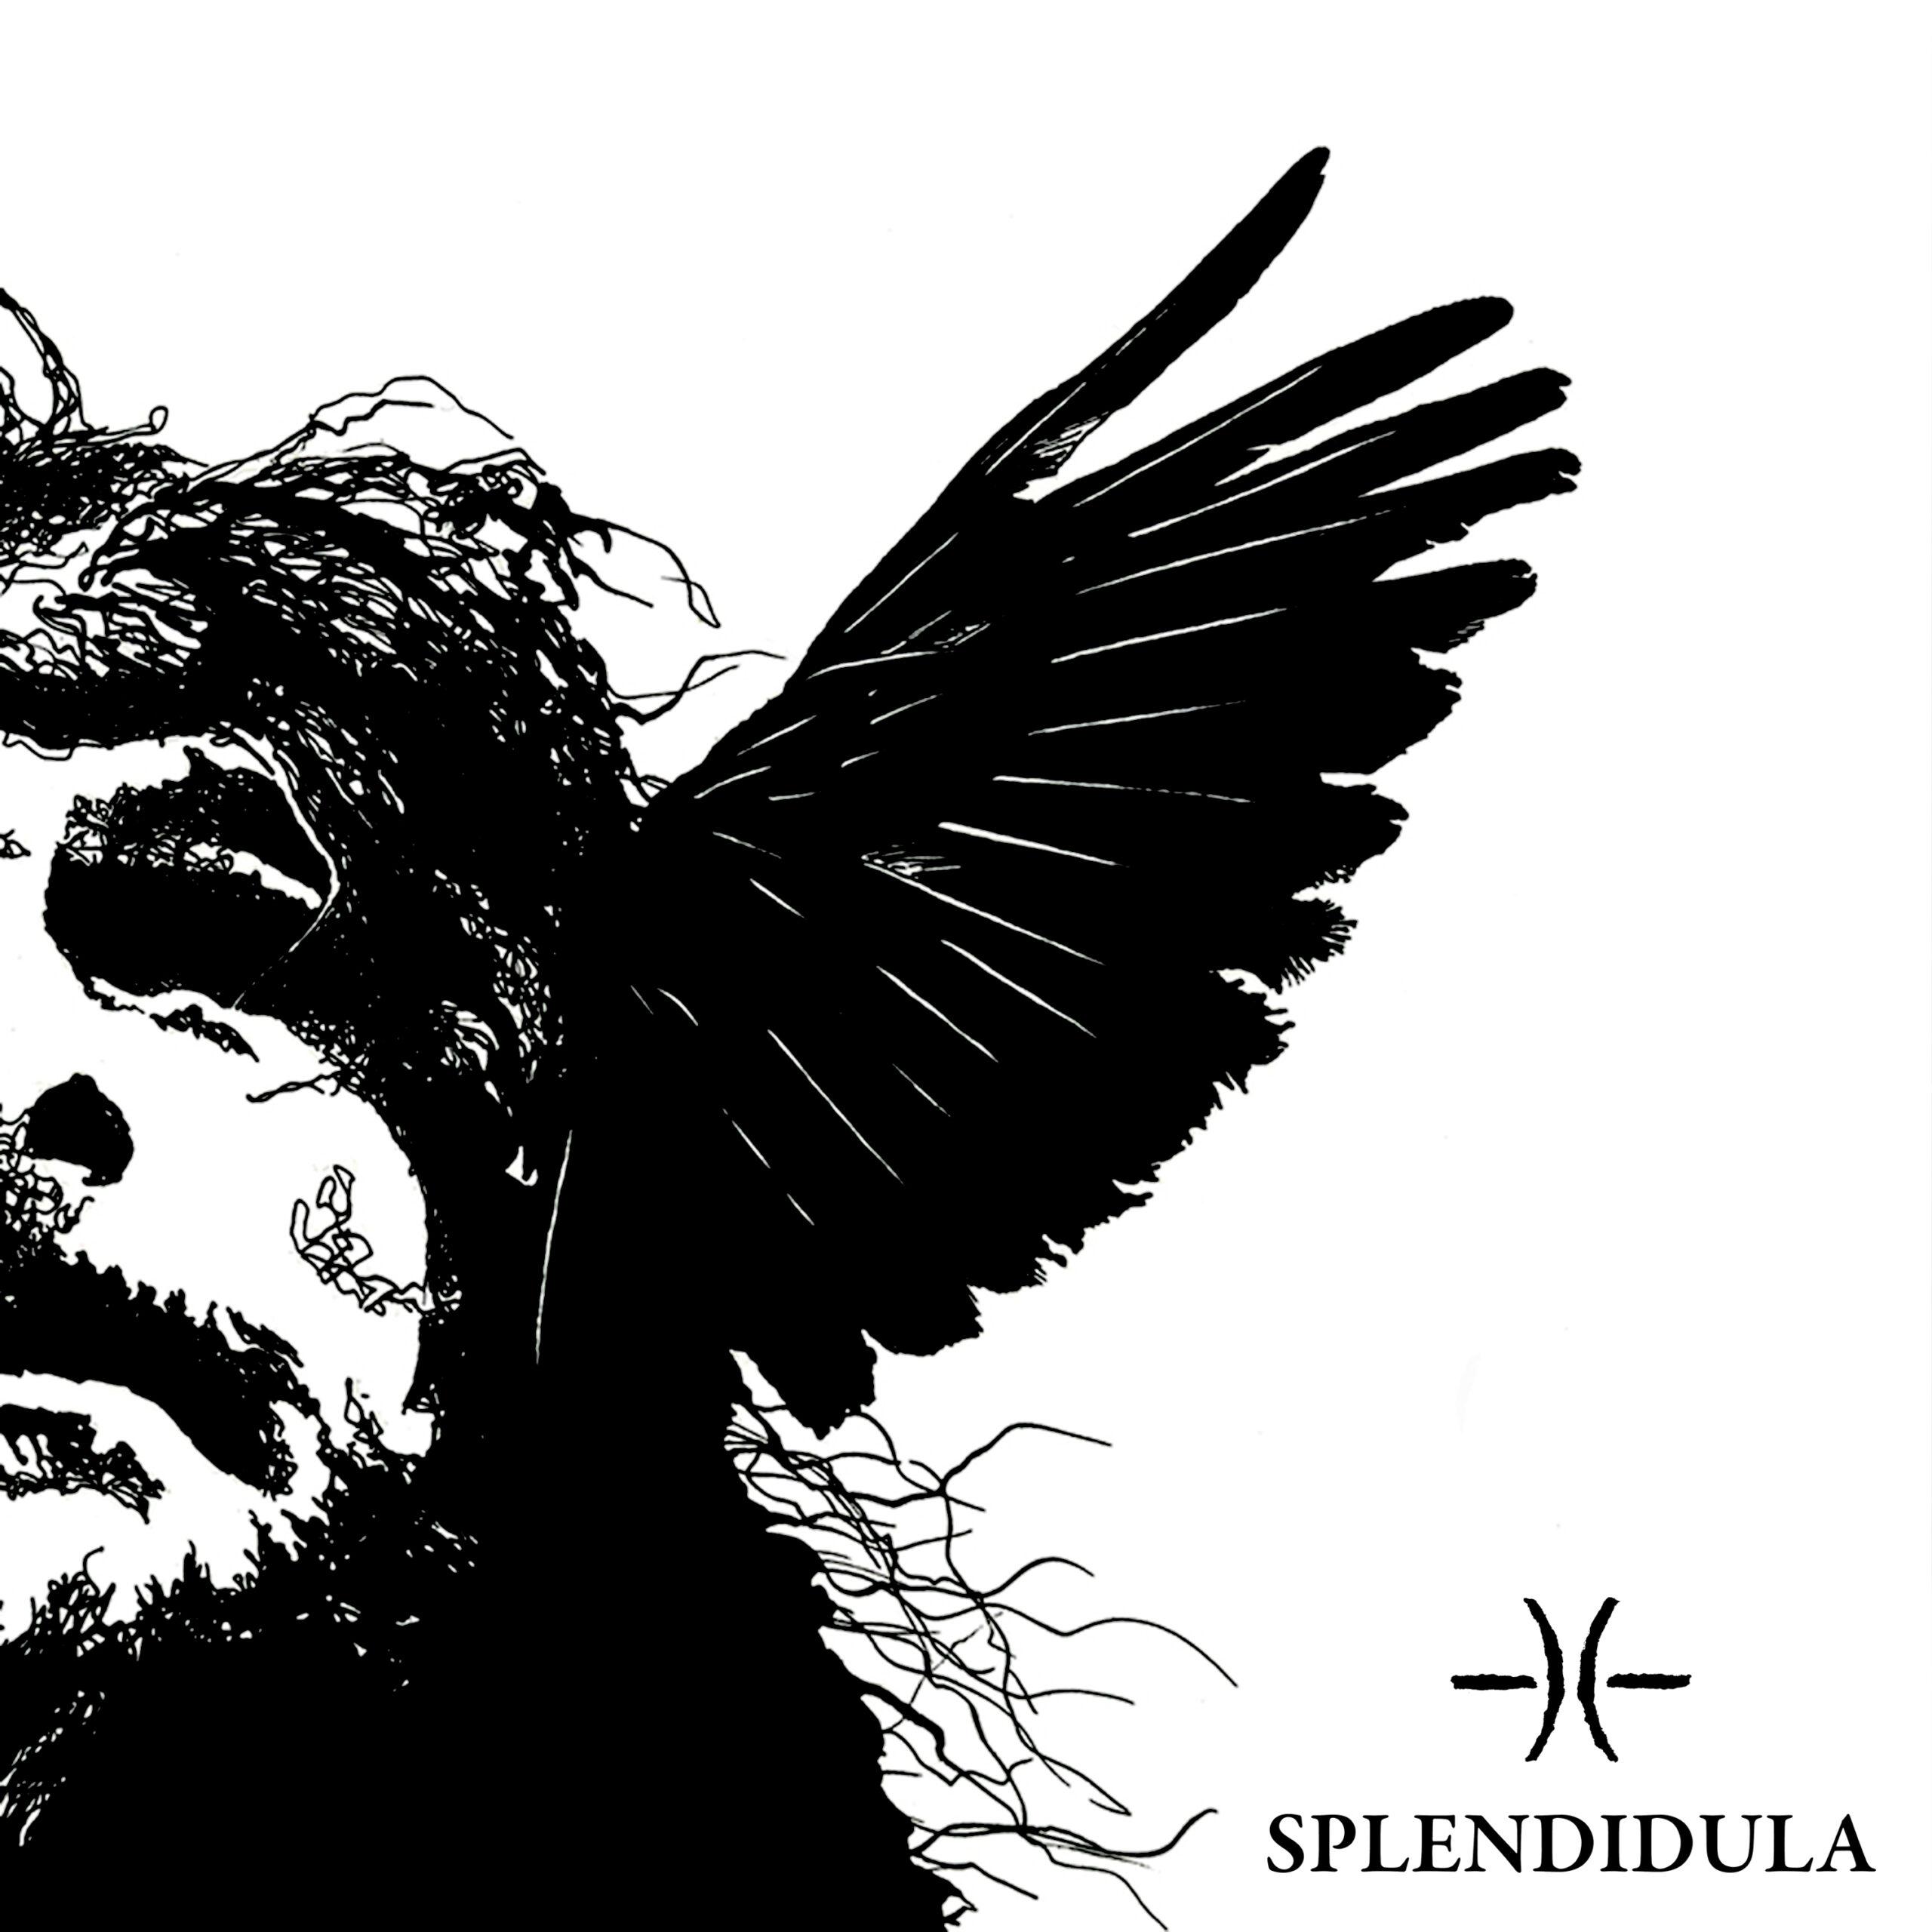 Splendidula – Somnus